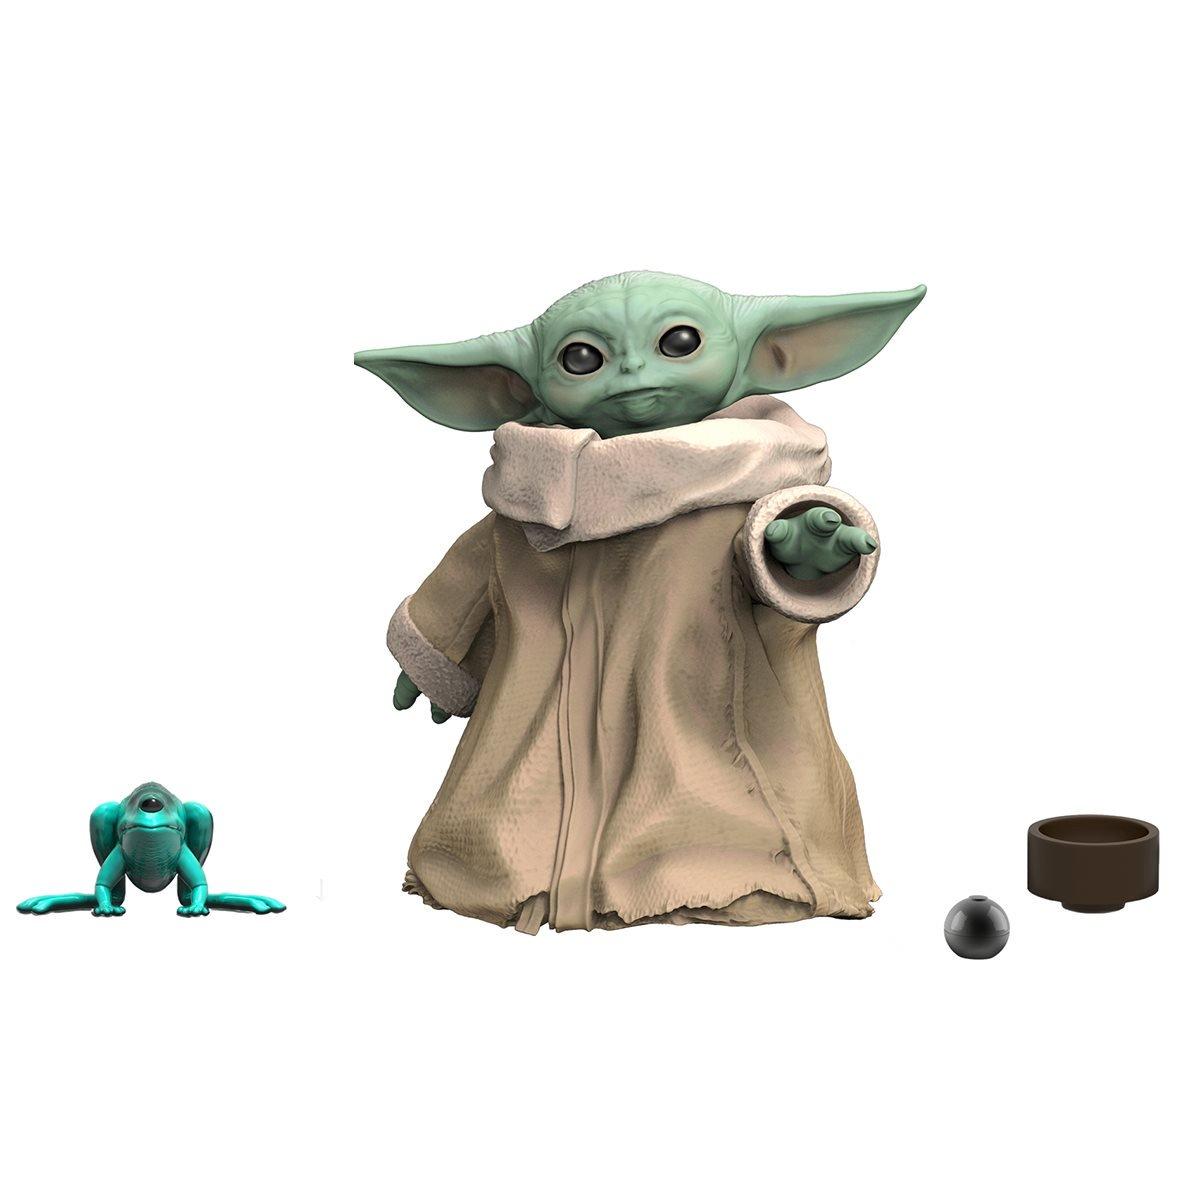 Hasbro - Star Wars - The Mandalorian - Baby Yoda - Action Figure - Baby Yoda - 01